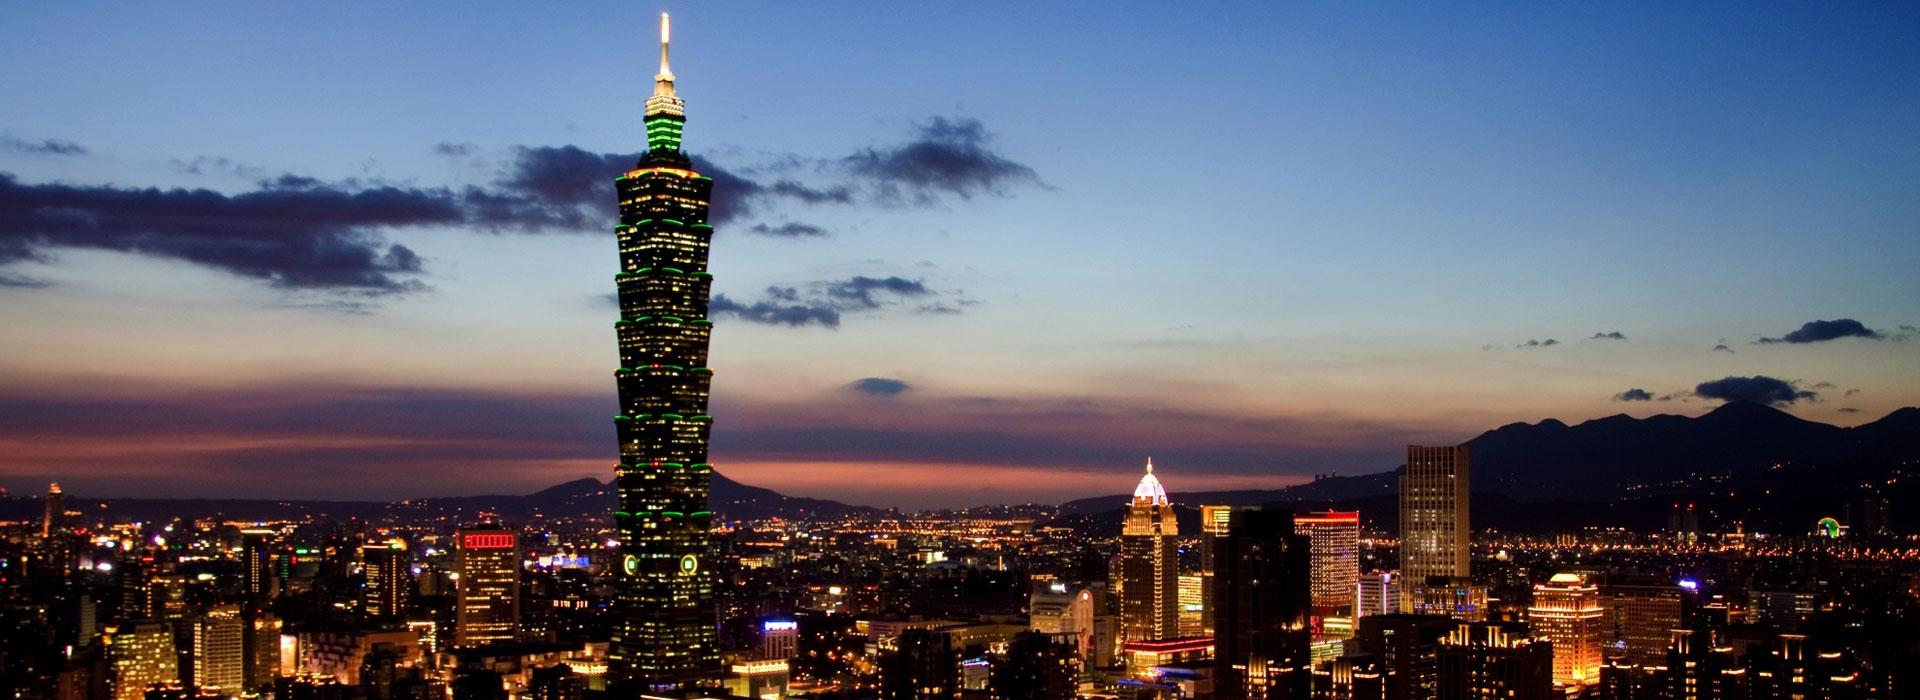 3D2N Taipei Discovery